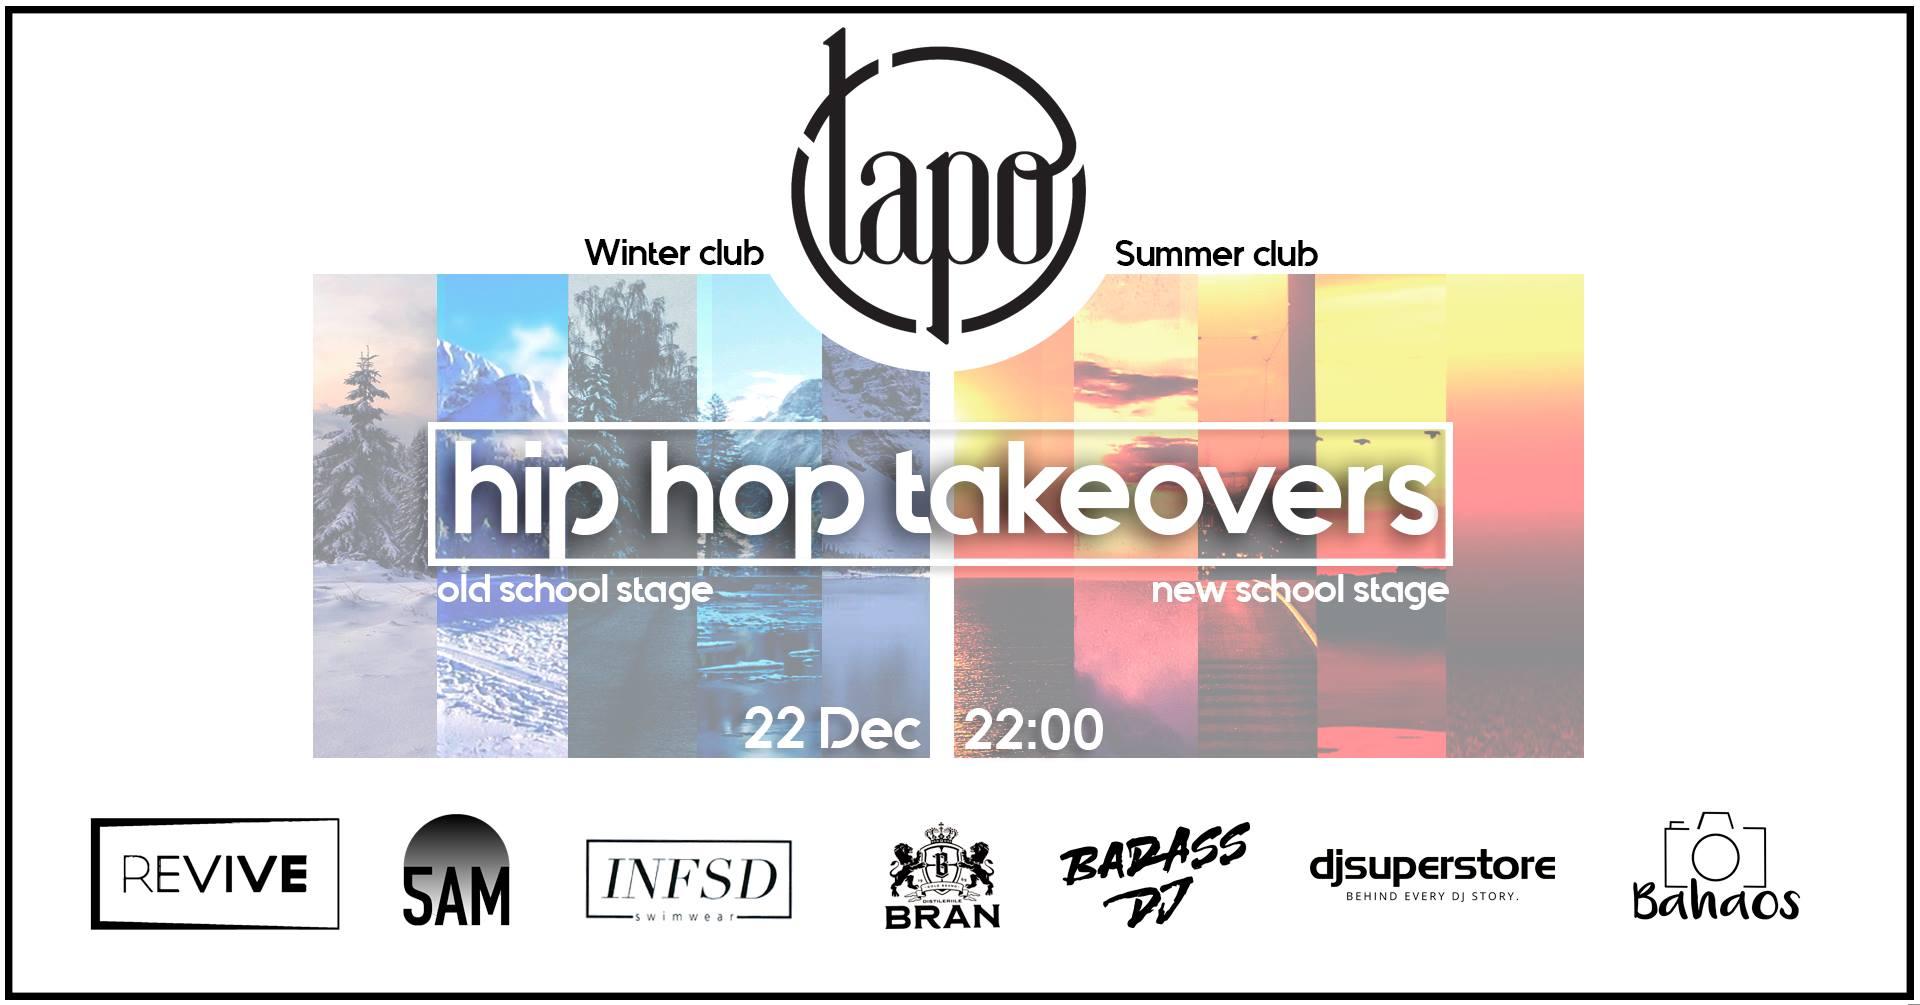 Hip Hop takeovers 5 la Tapo